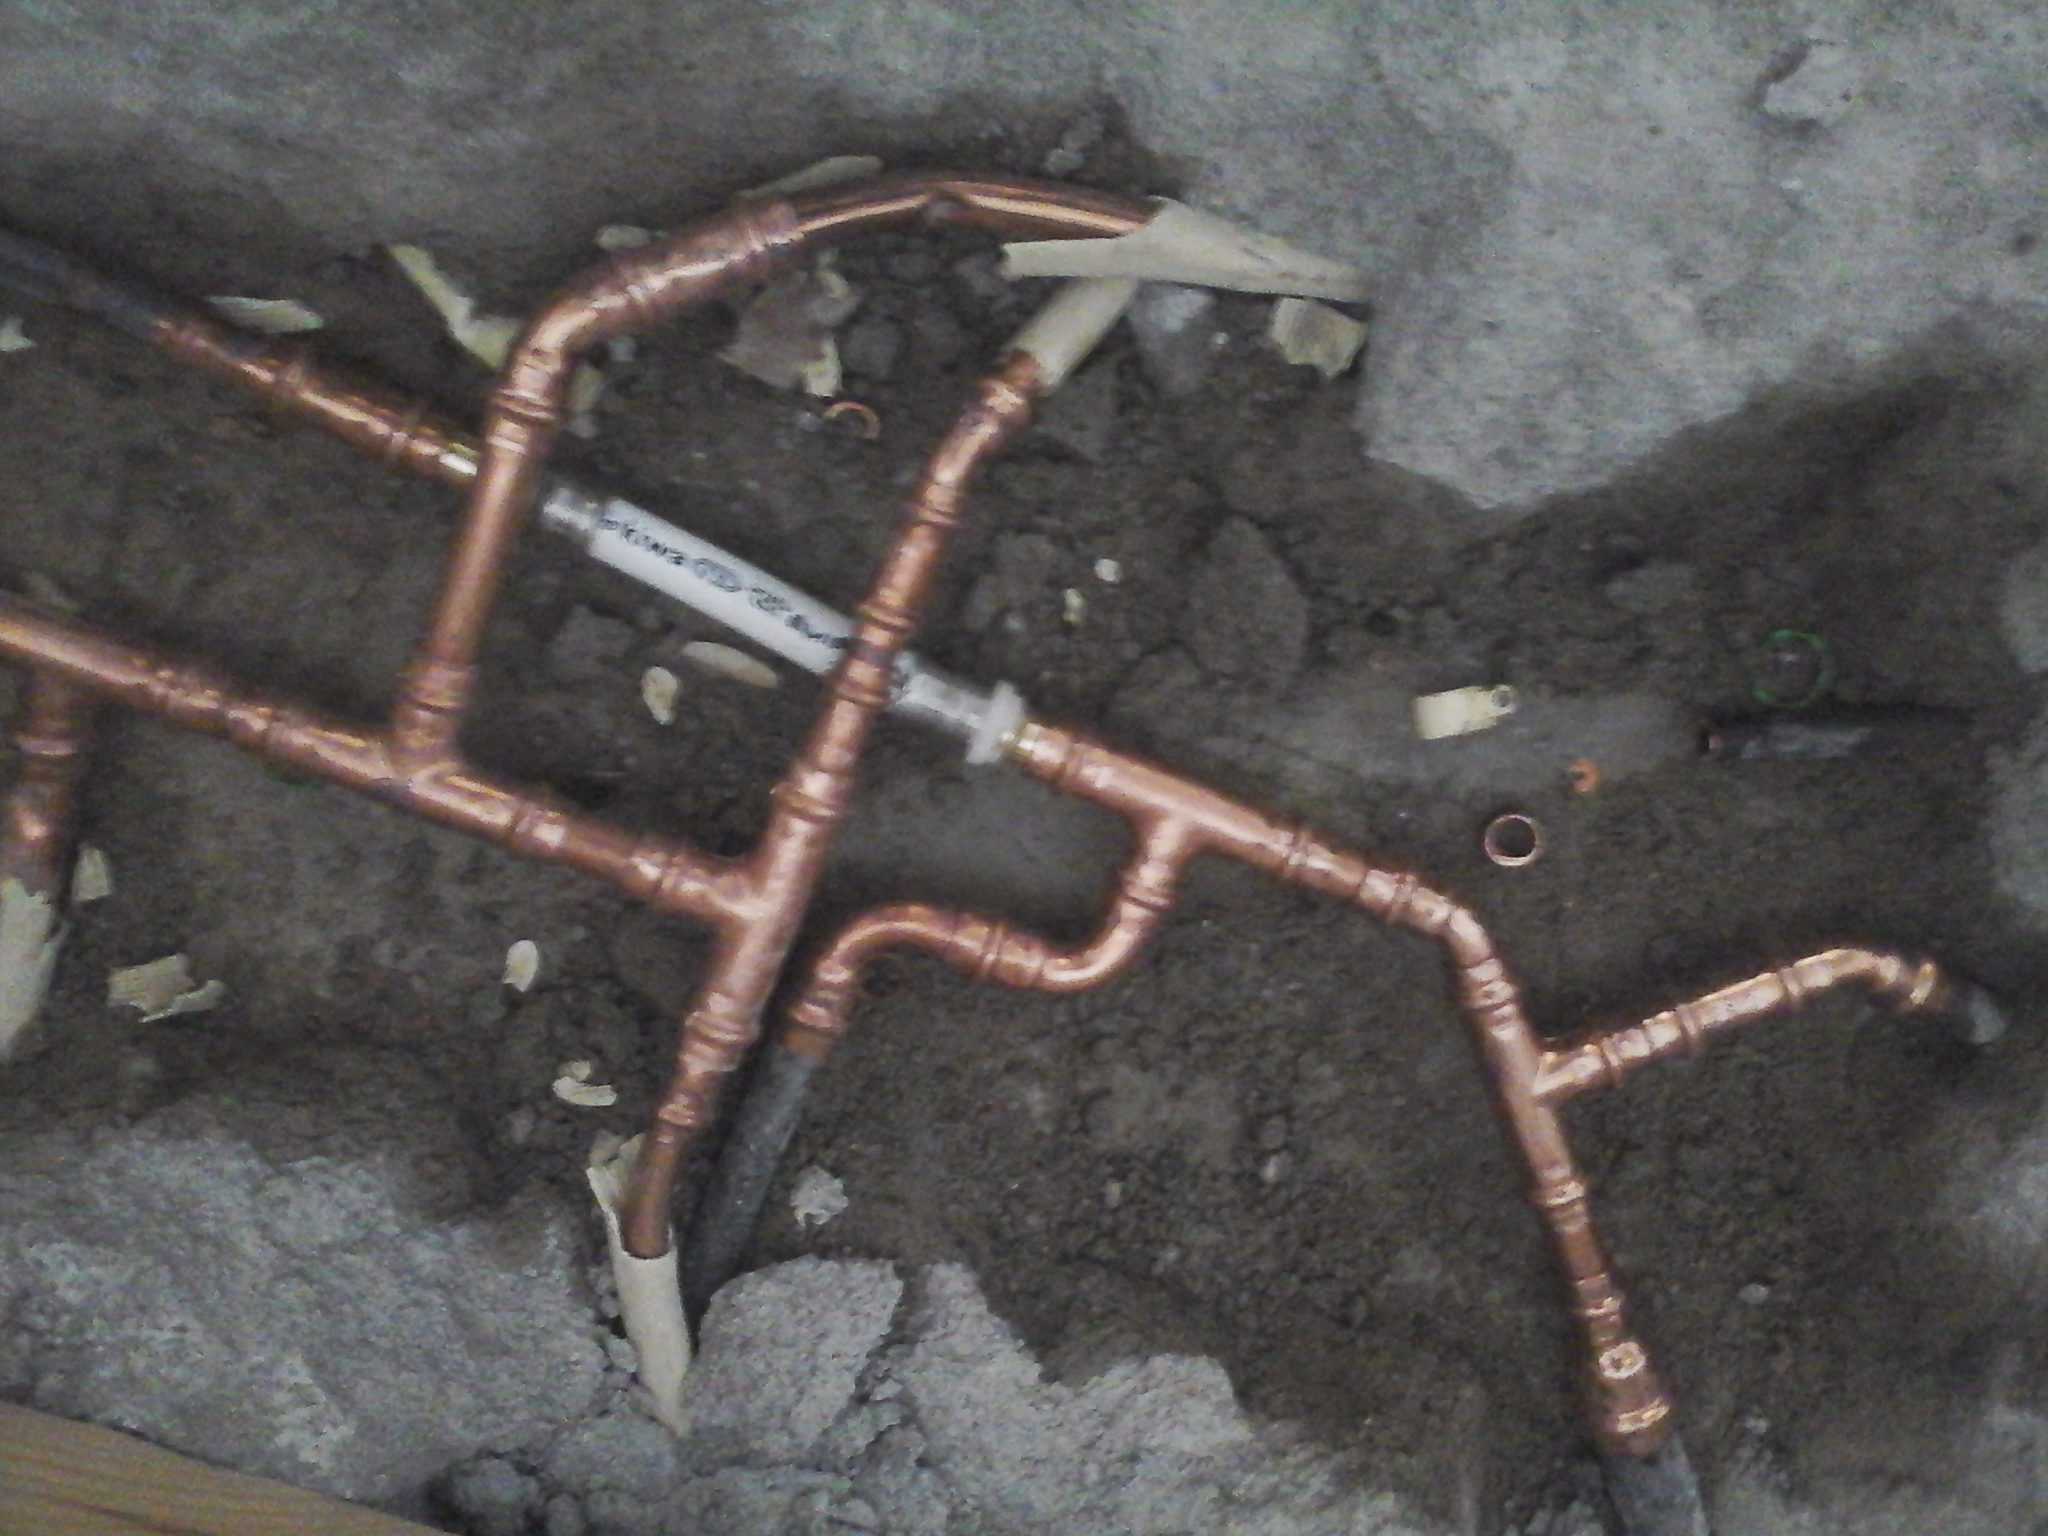 Viega perssysteem /leidingen kopere buis en c.v buis